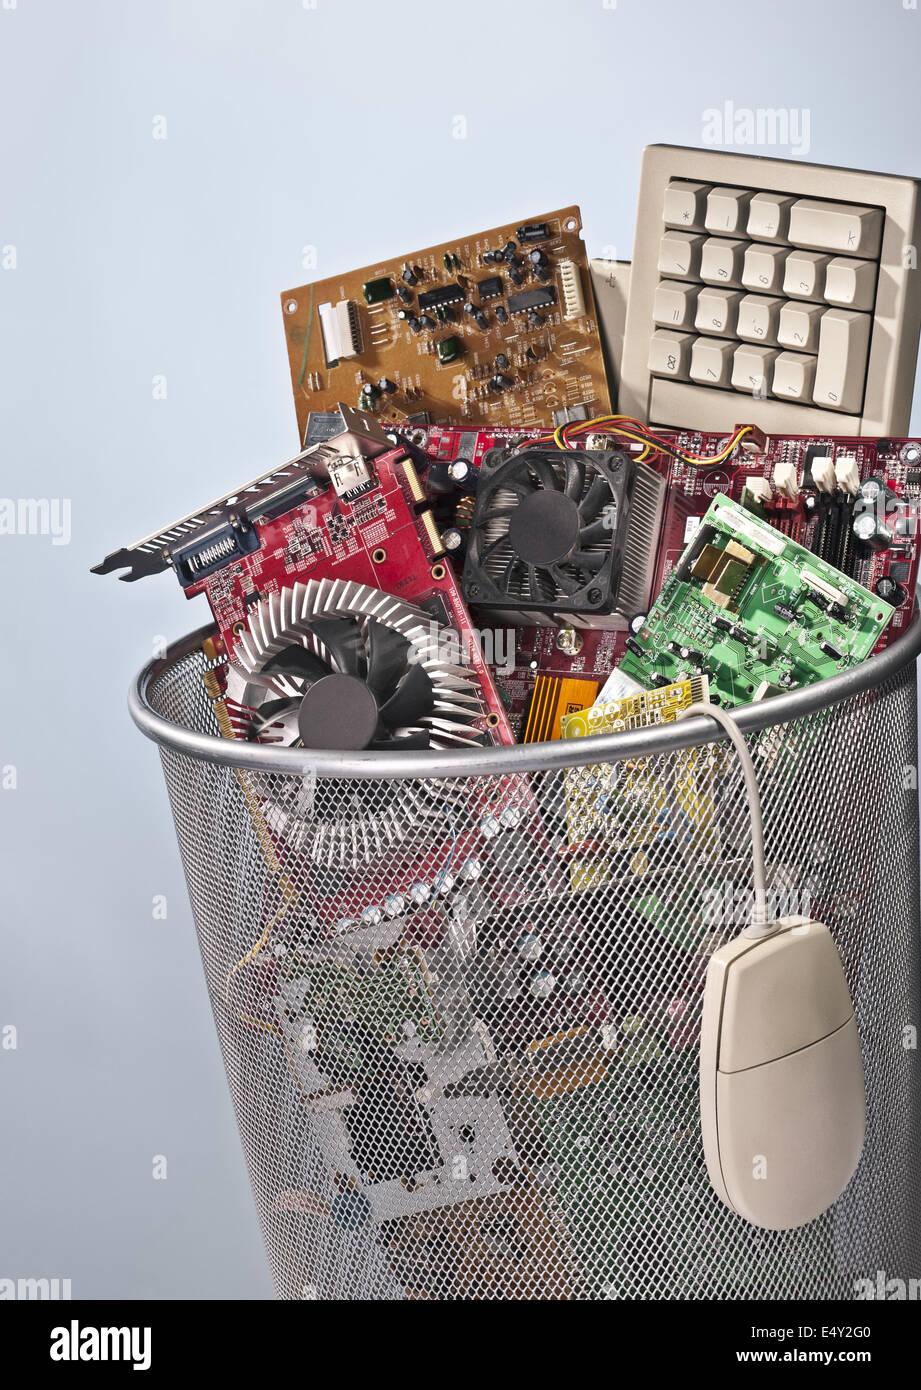 Cesta de papel llenos de residuos electrónicos Imagen De Stock